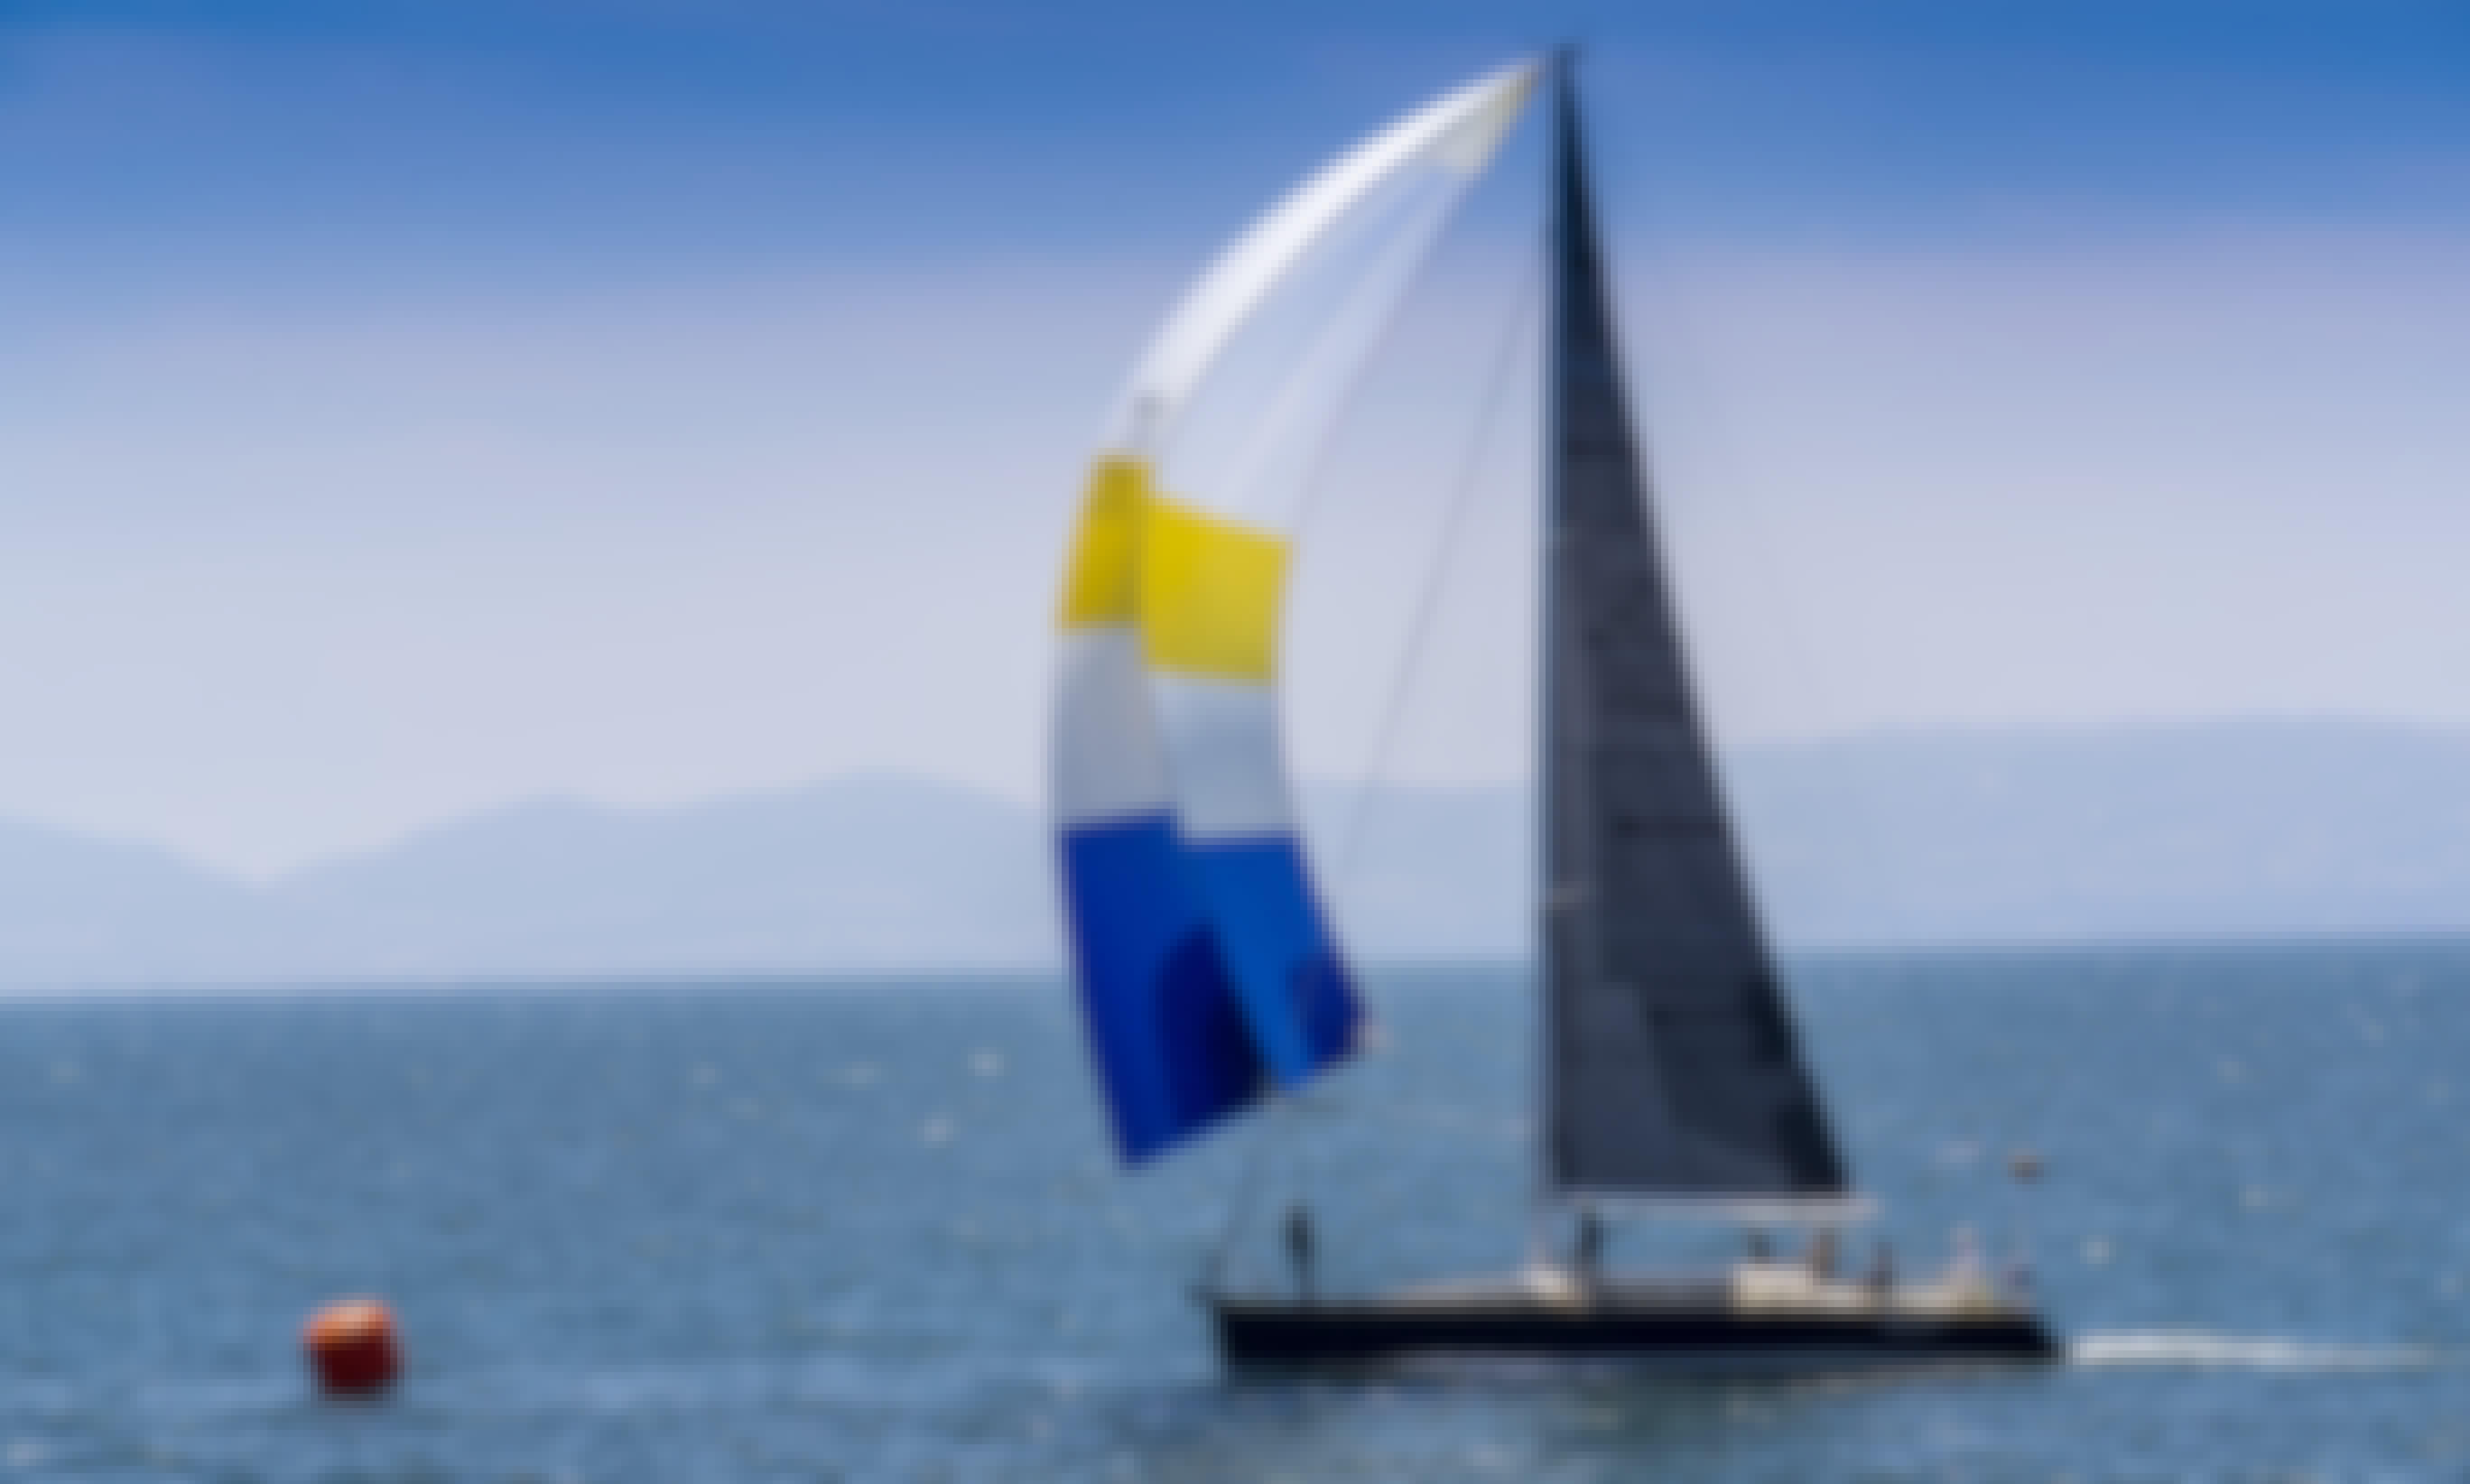 Create lifelong memories and enjoy the thrill of sailing - 47' racing sailboat